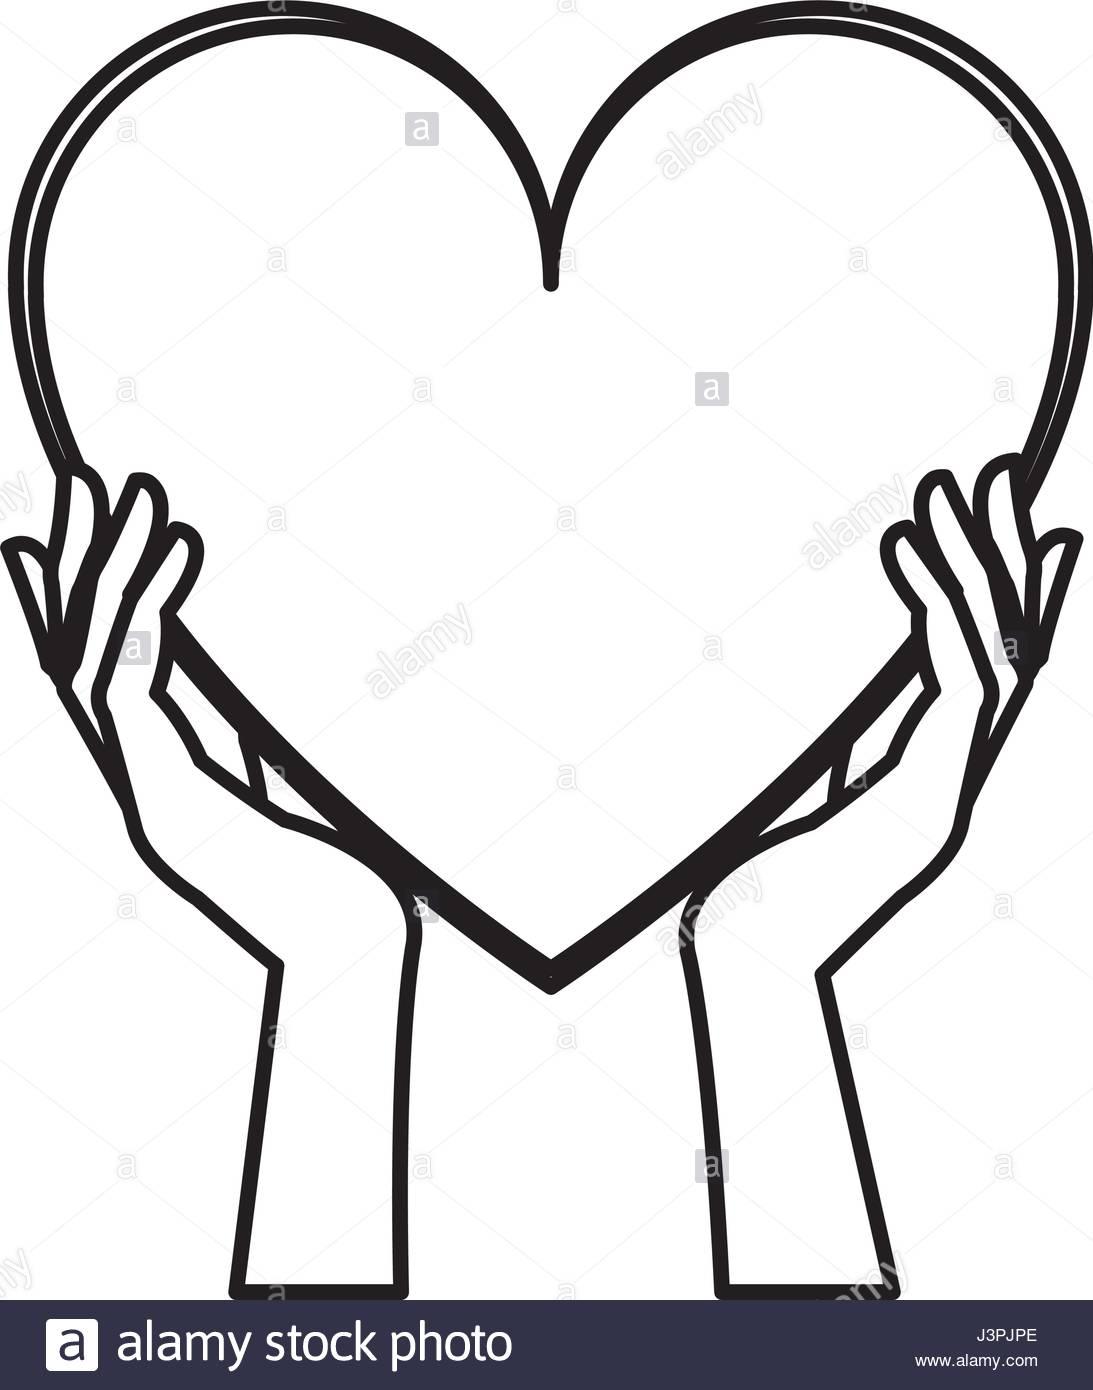 1093x1390 Hands Holding Heart Blood Donation Line Stock Vector Art